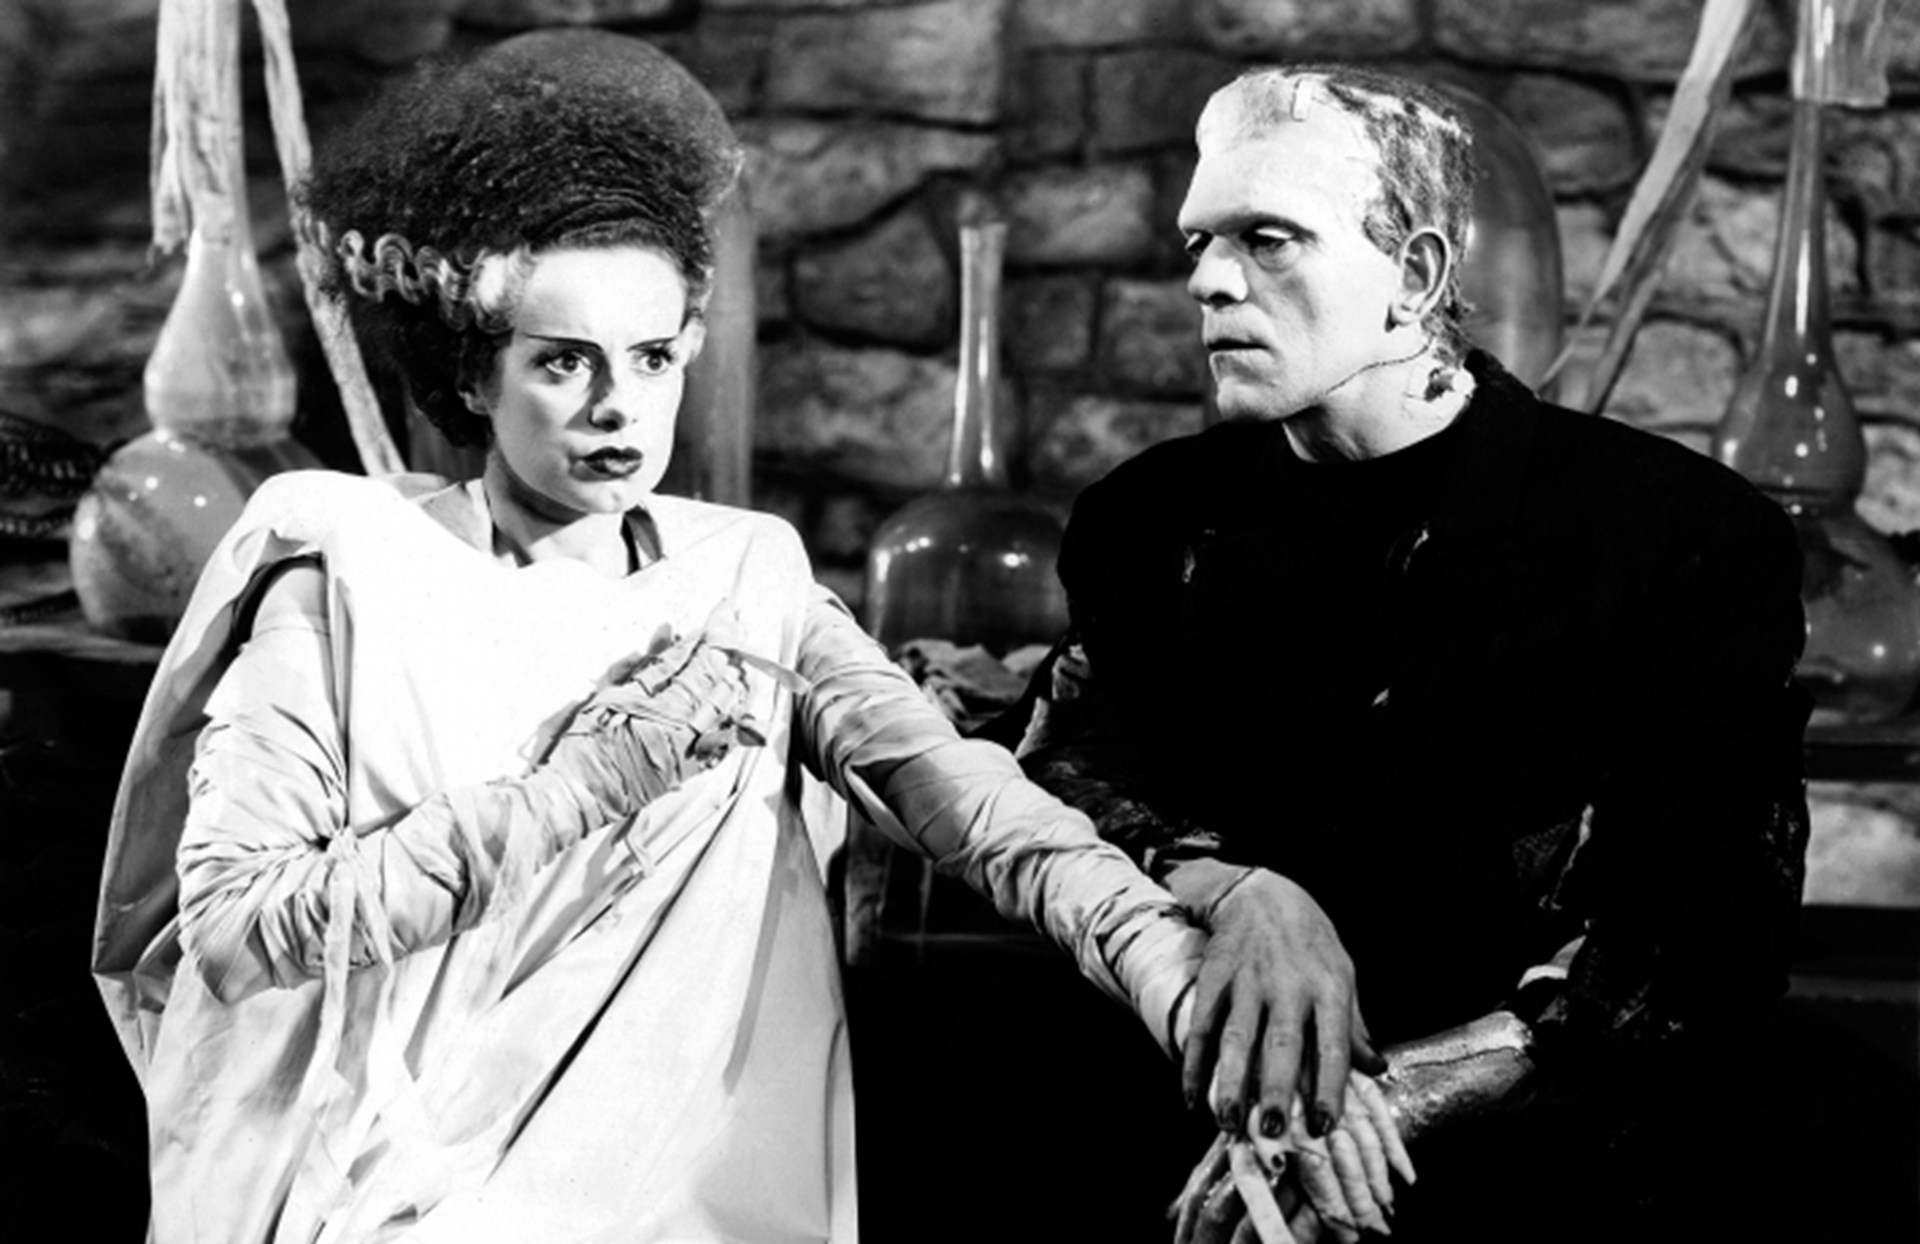 The Brilliance Of The Original Frankenstein Films Foundation For